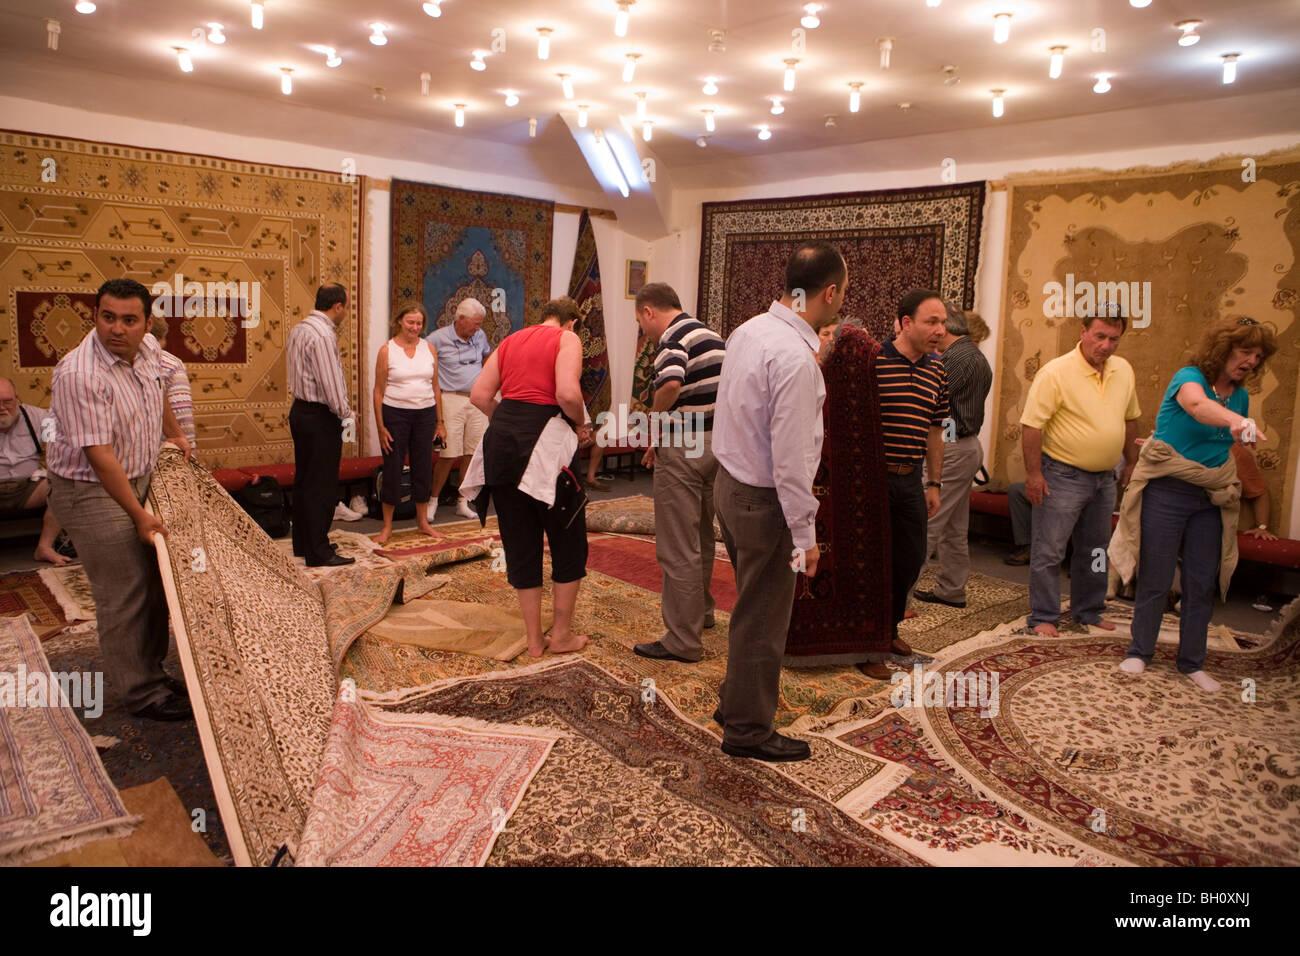 People looking at carpets at a Rug Factory, Dalyan, Turkey, Europe - Stock Image